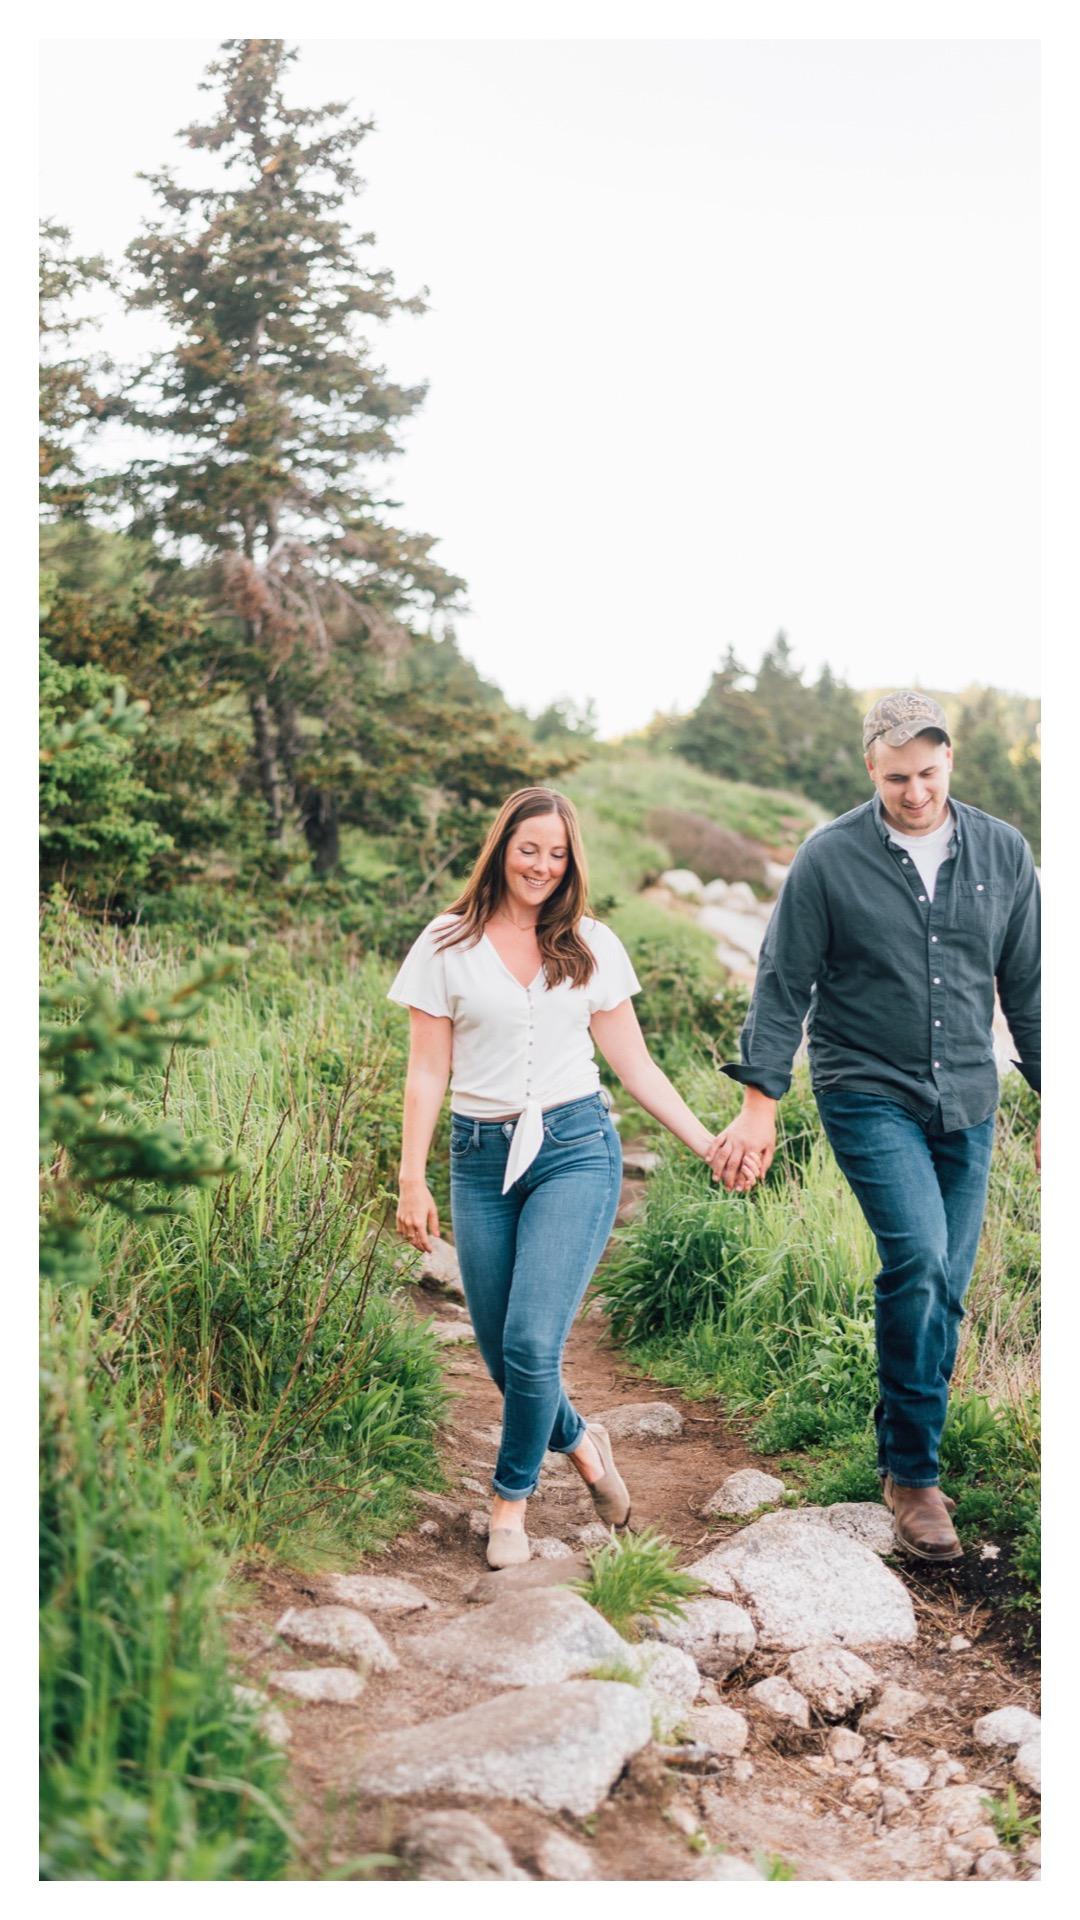 Engagement by the Ocean - Mackie & Jessie   Halifax Wedding Photographer